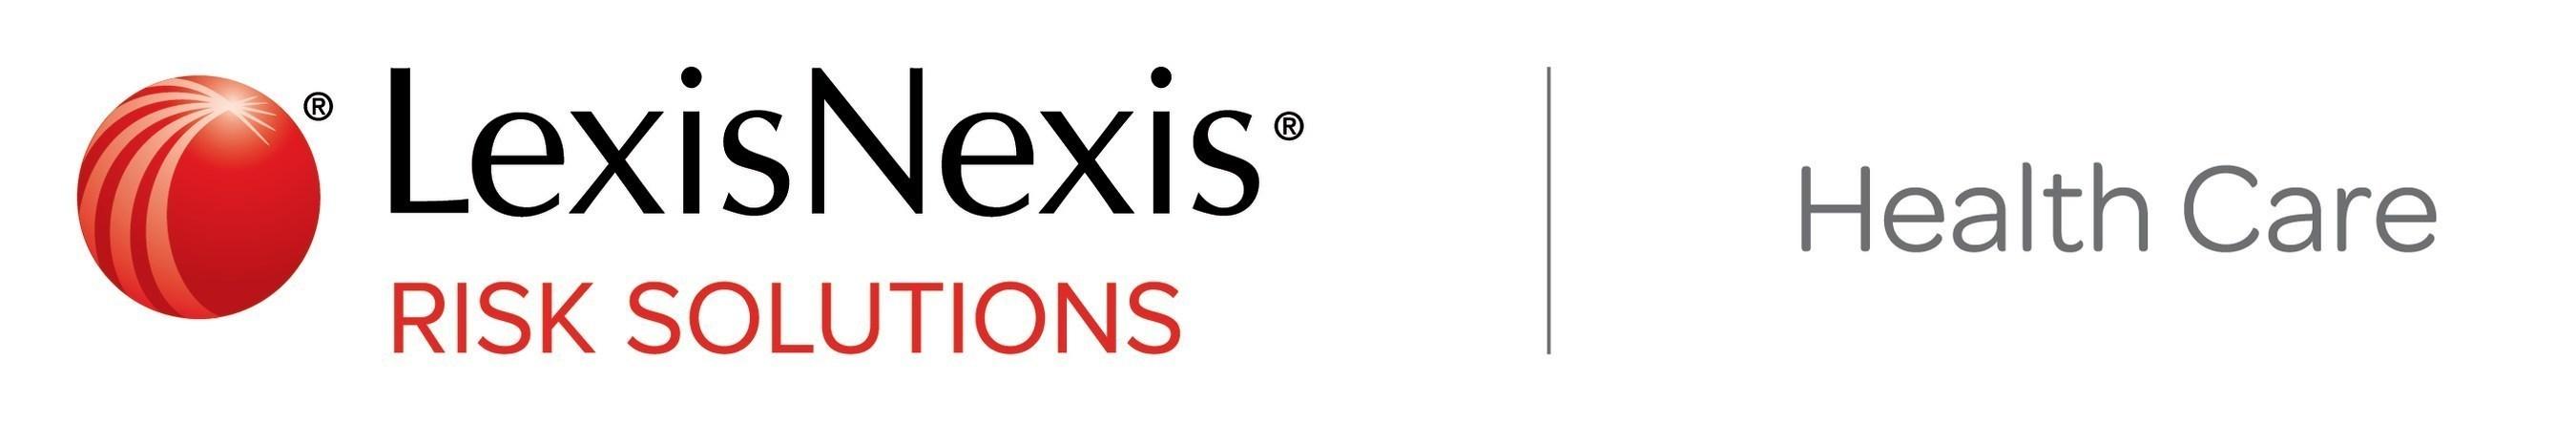 LexisNexis Risk Solutions Health Care